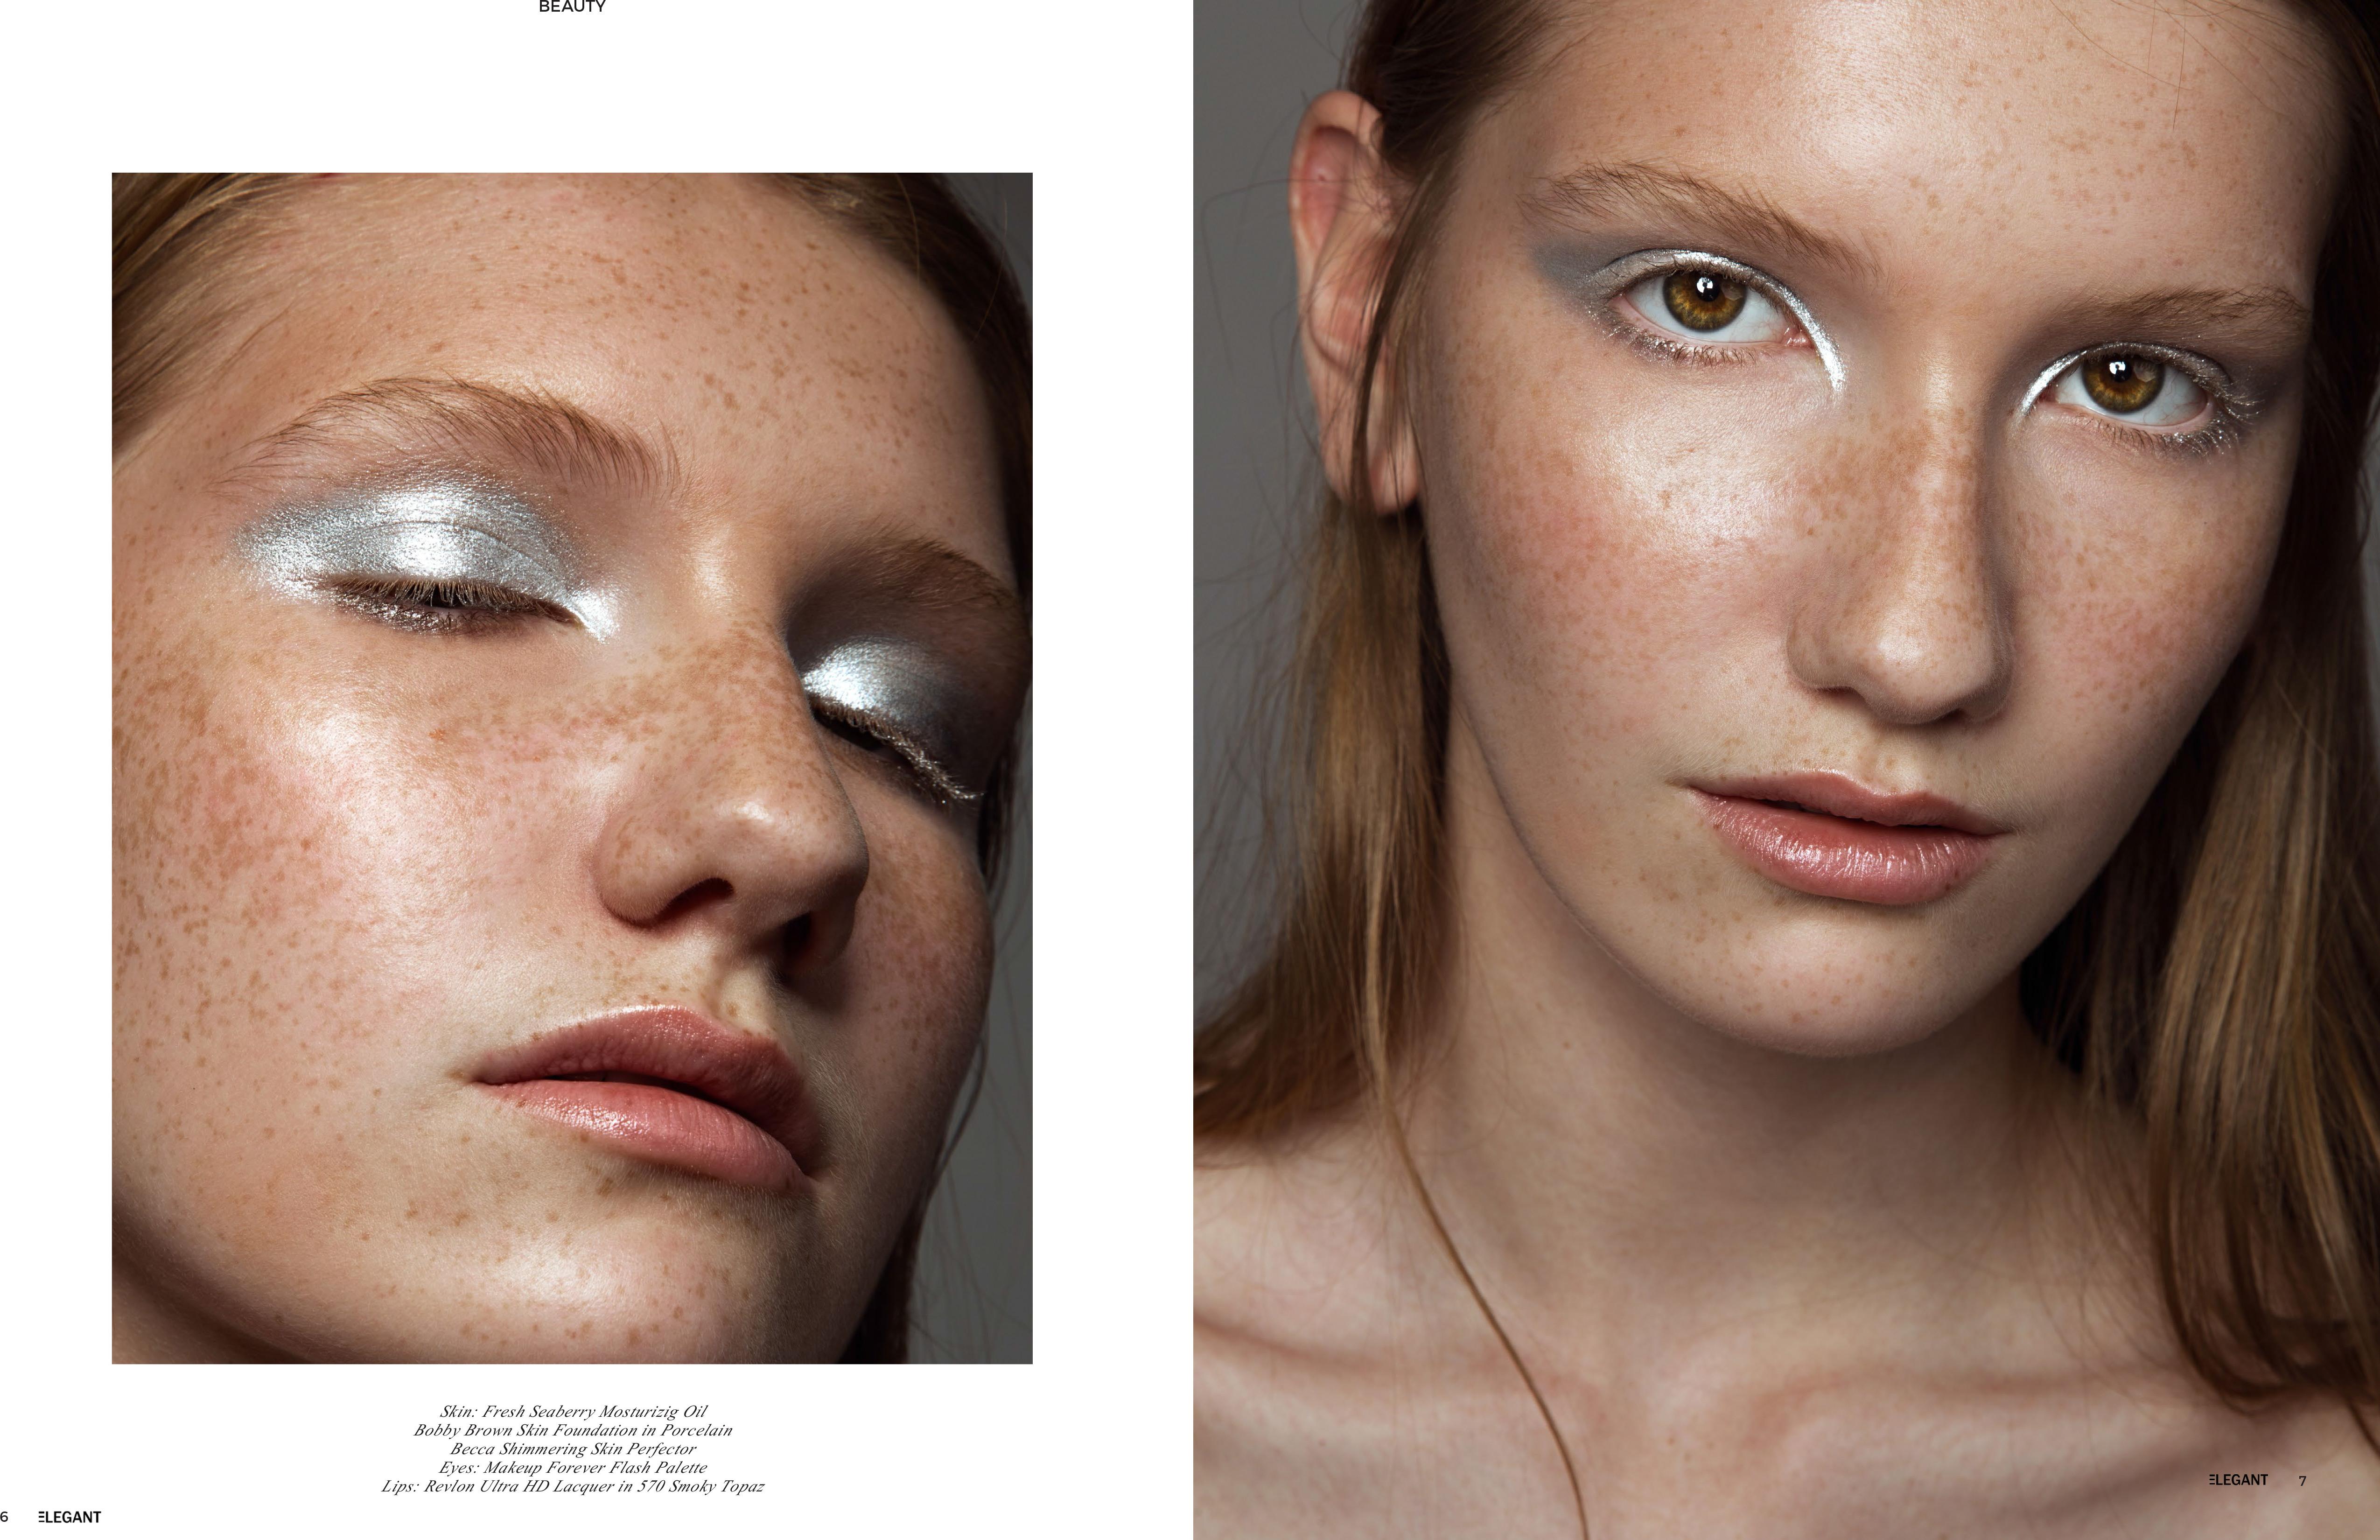 Molten - ELEGANT Magazine